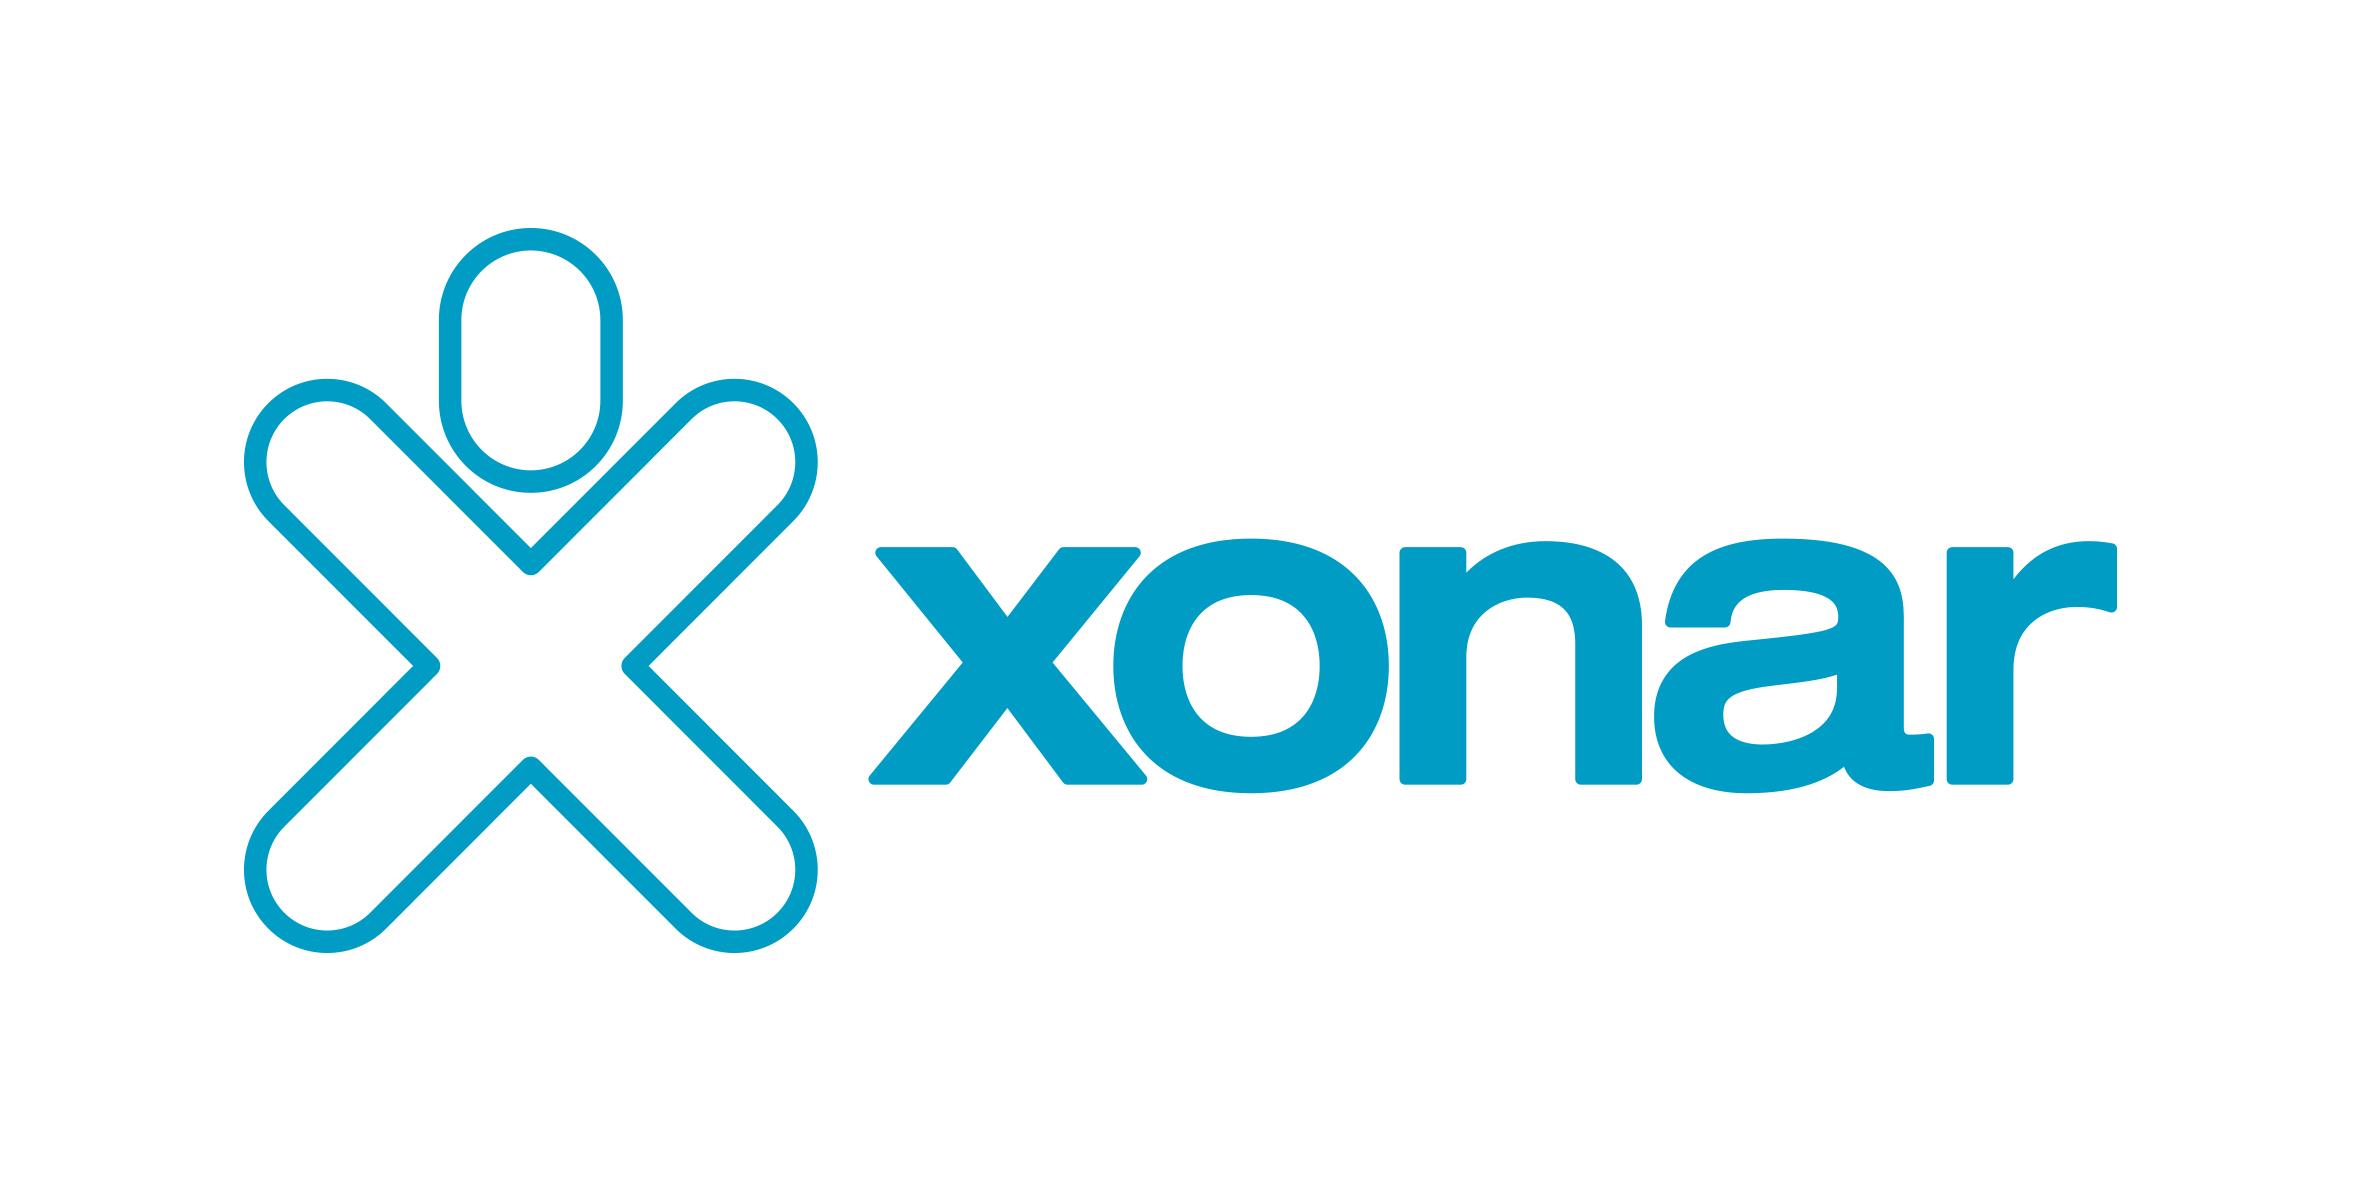 XONAR logo wit